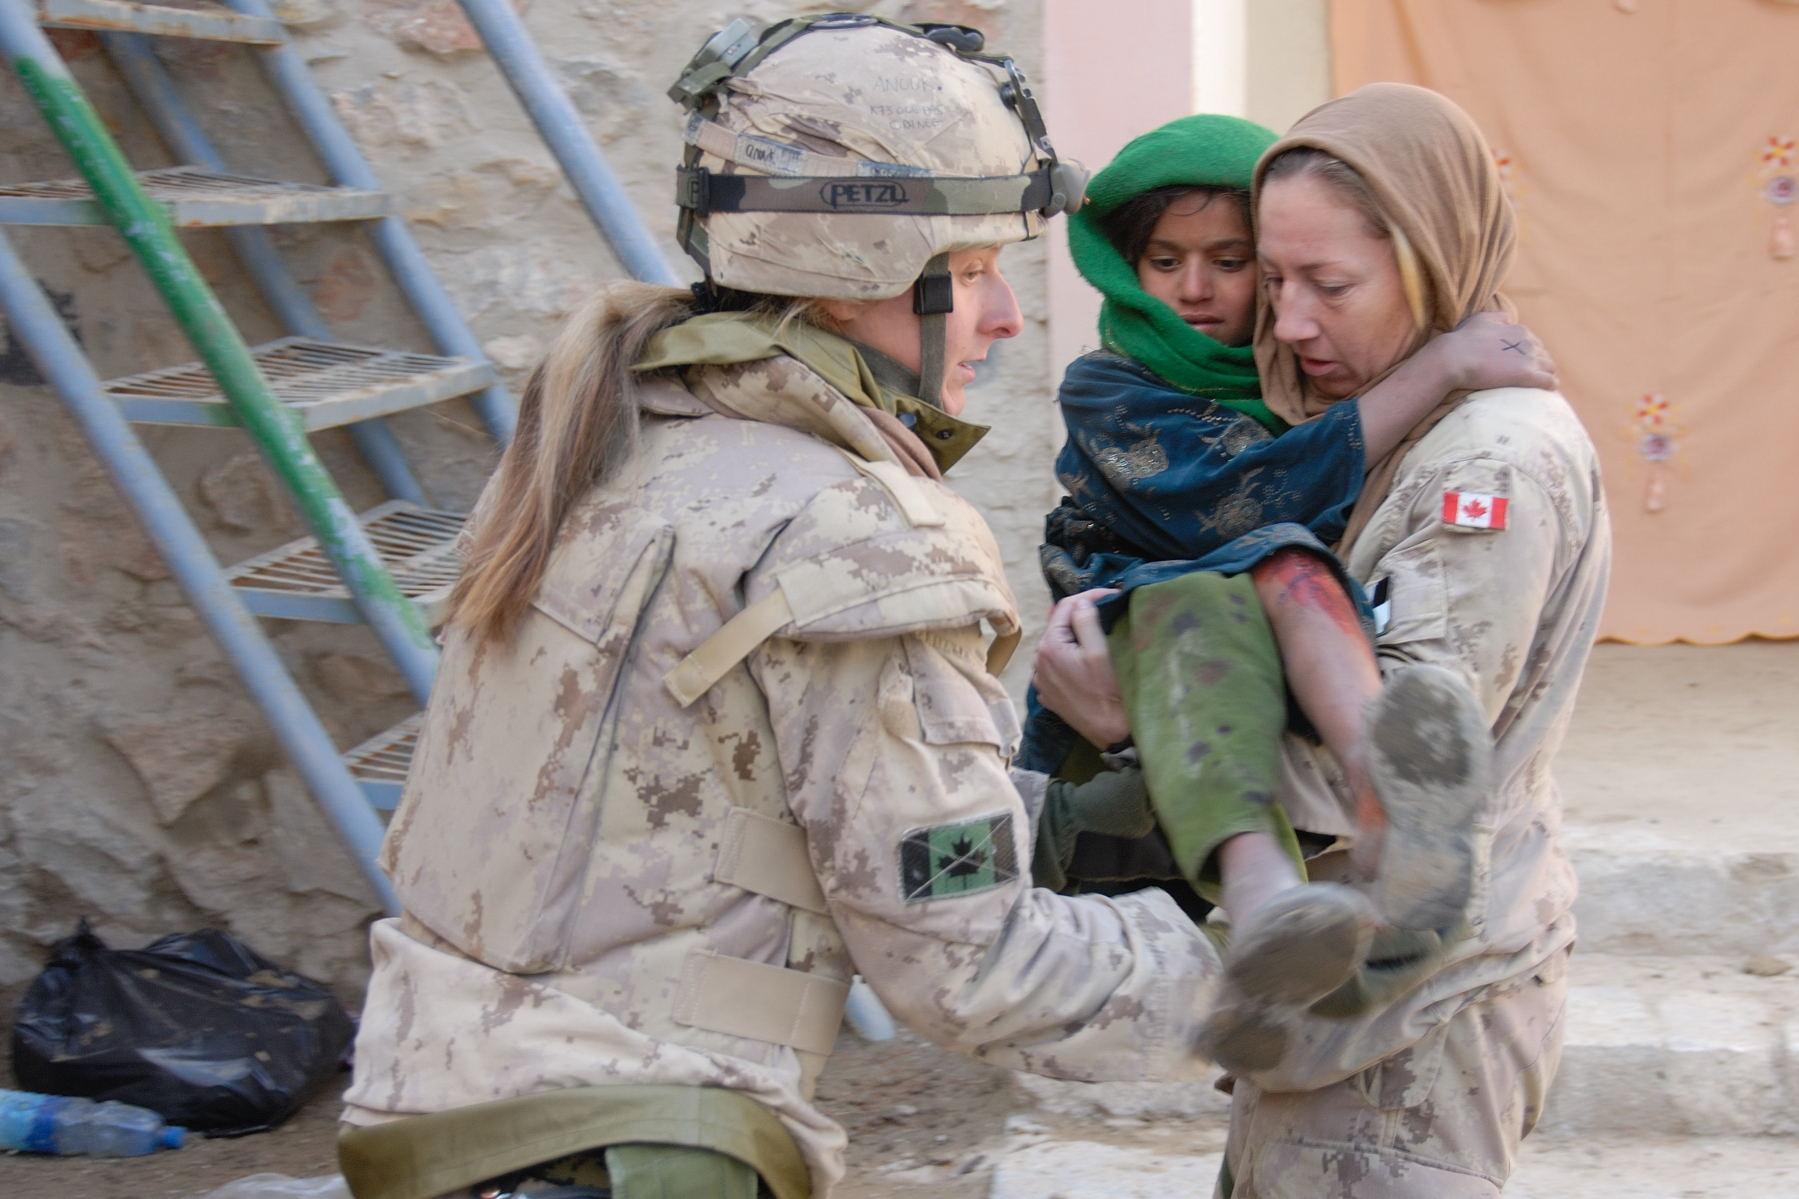 afghanistan photo essay